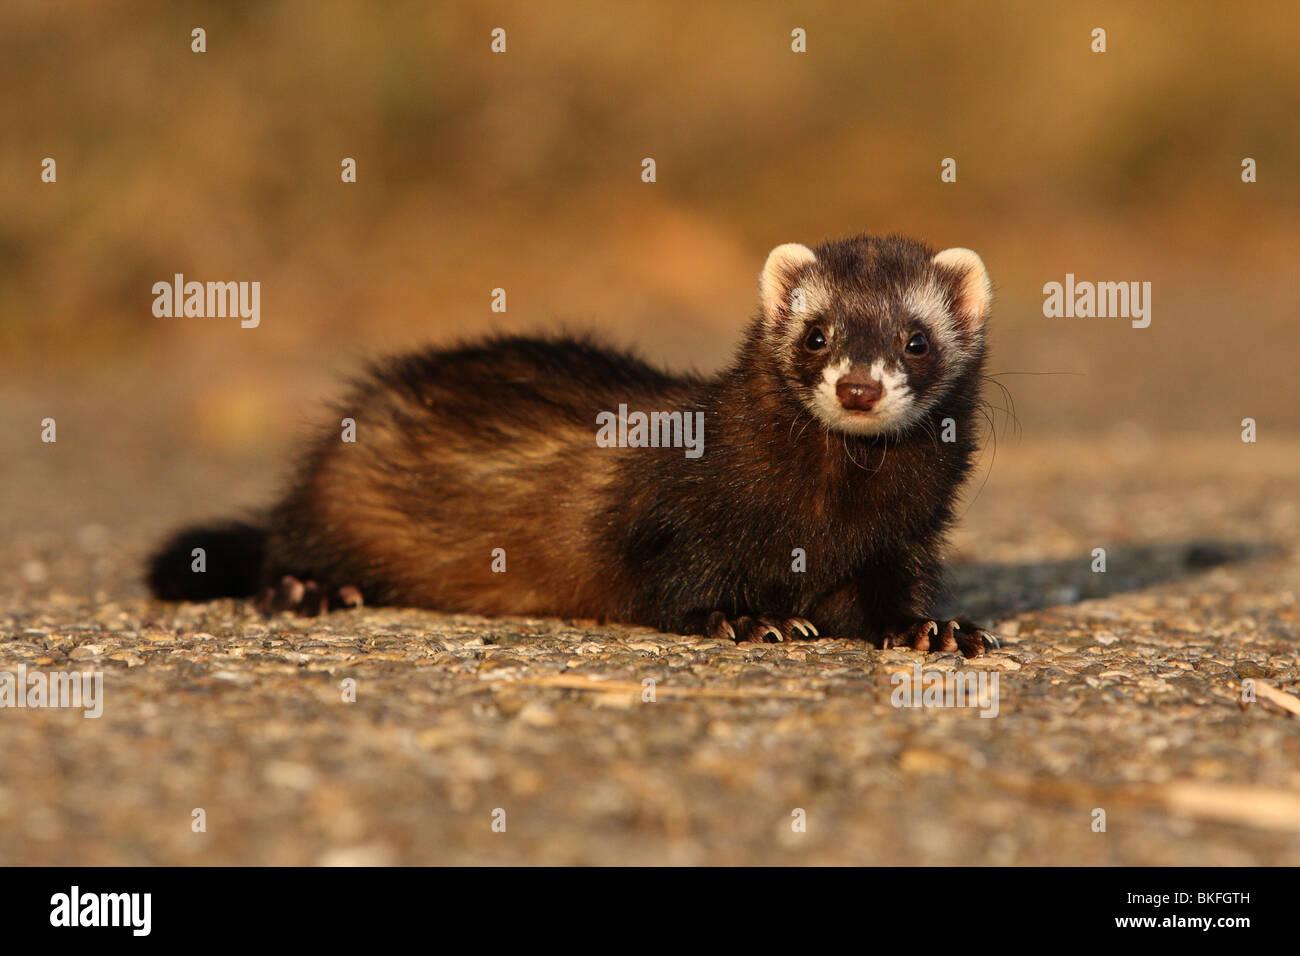 Frettchen / ferret - Stock Image